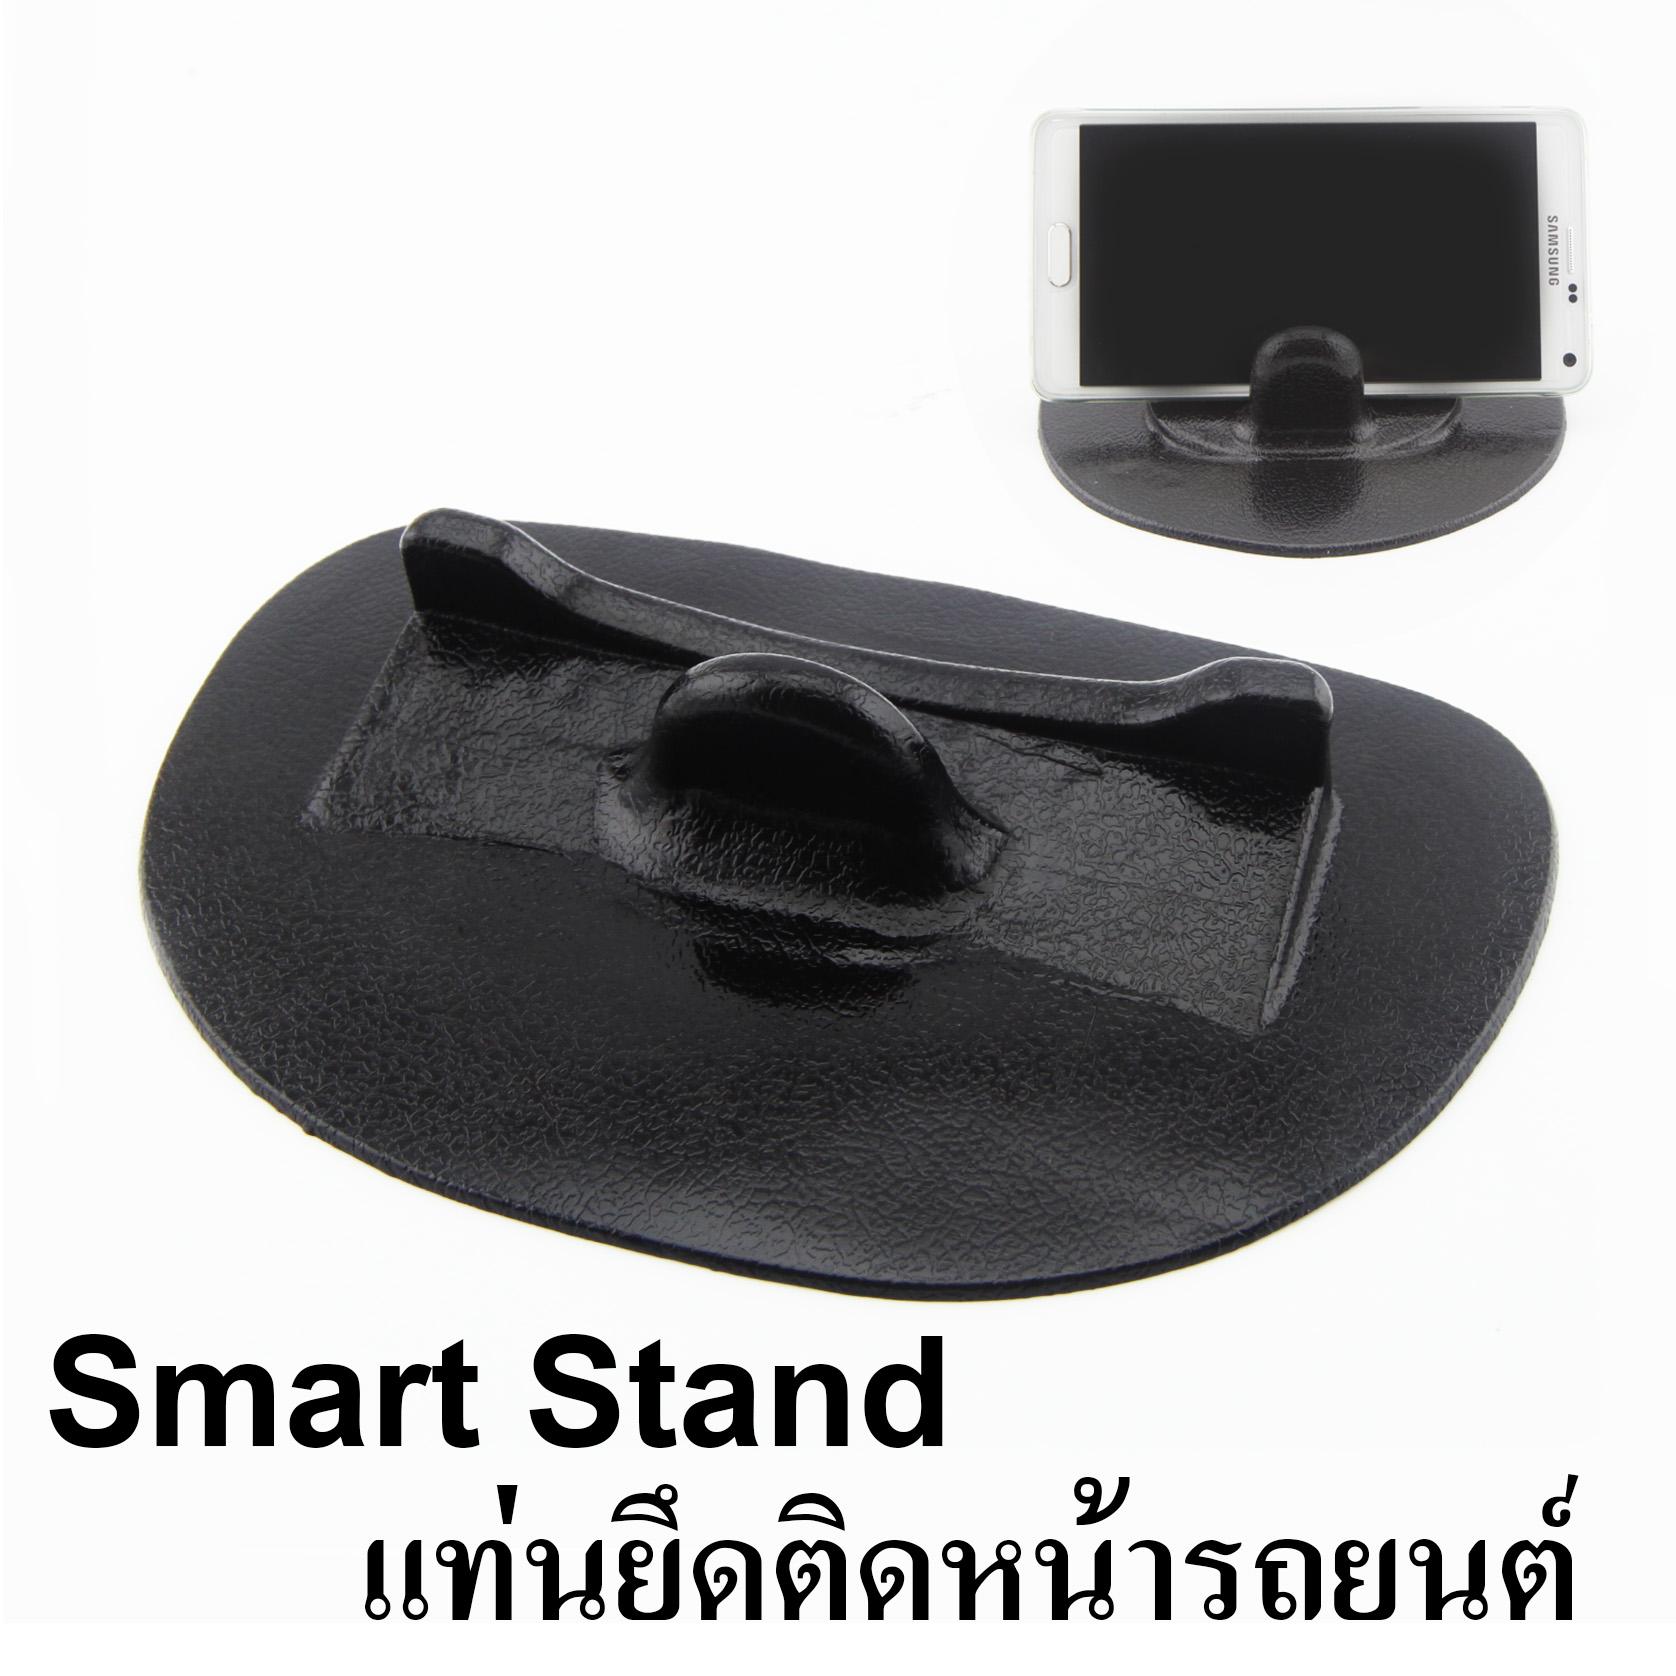 Smart Stand แท่นยึดติดหน้ารถยนต์สำหรับวาง Smart Phone iPhone, Samsung Galaxy